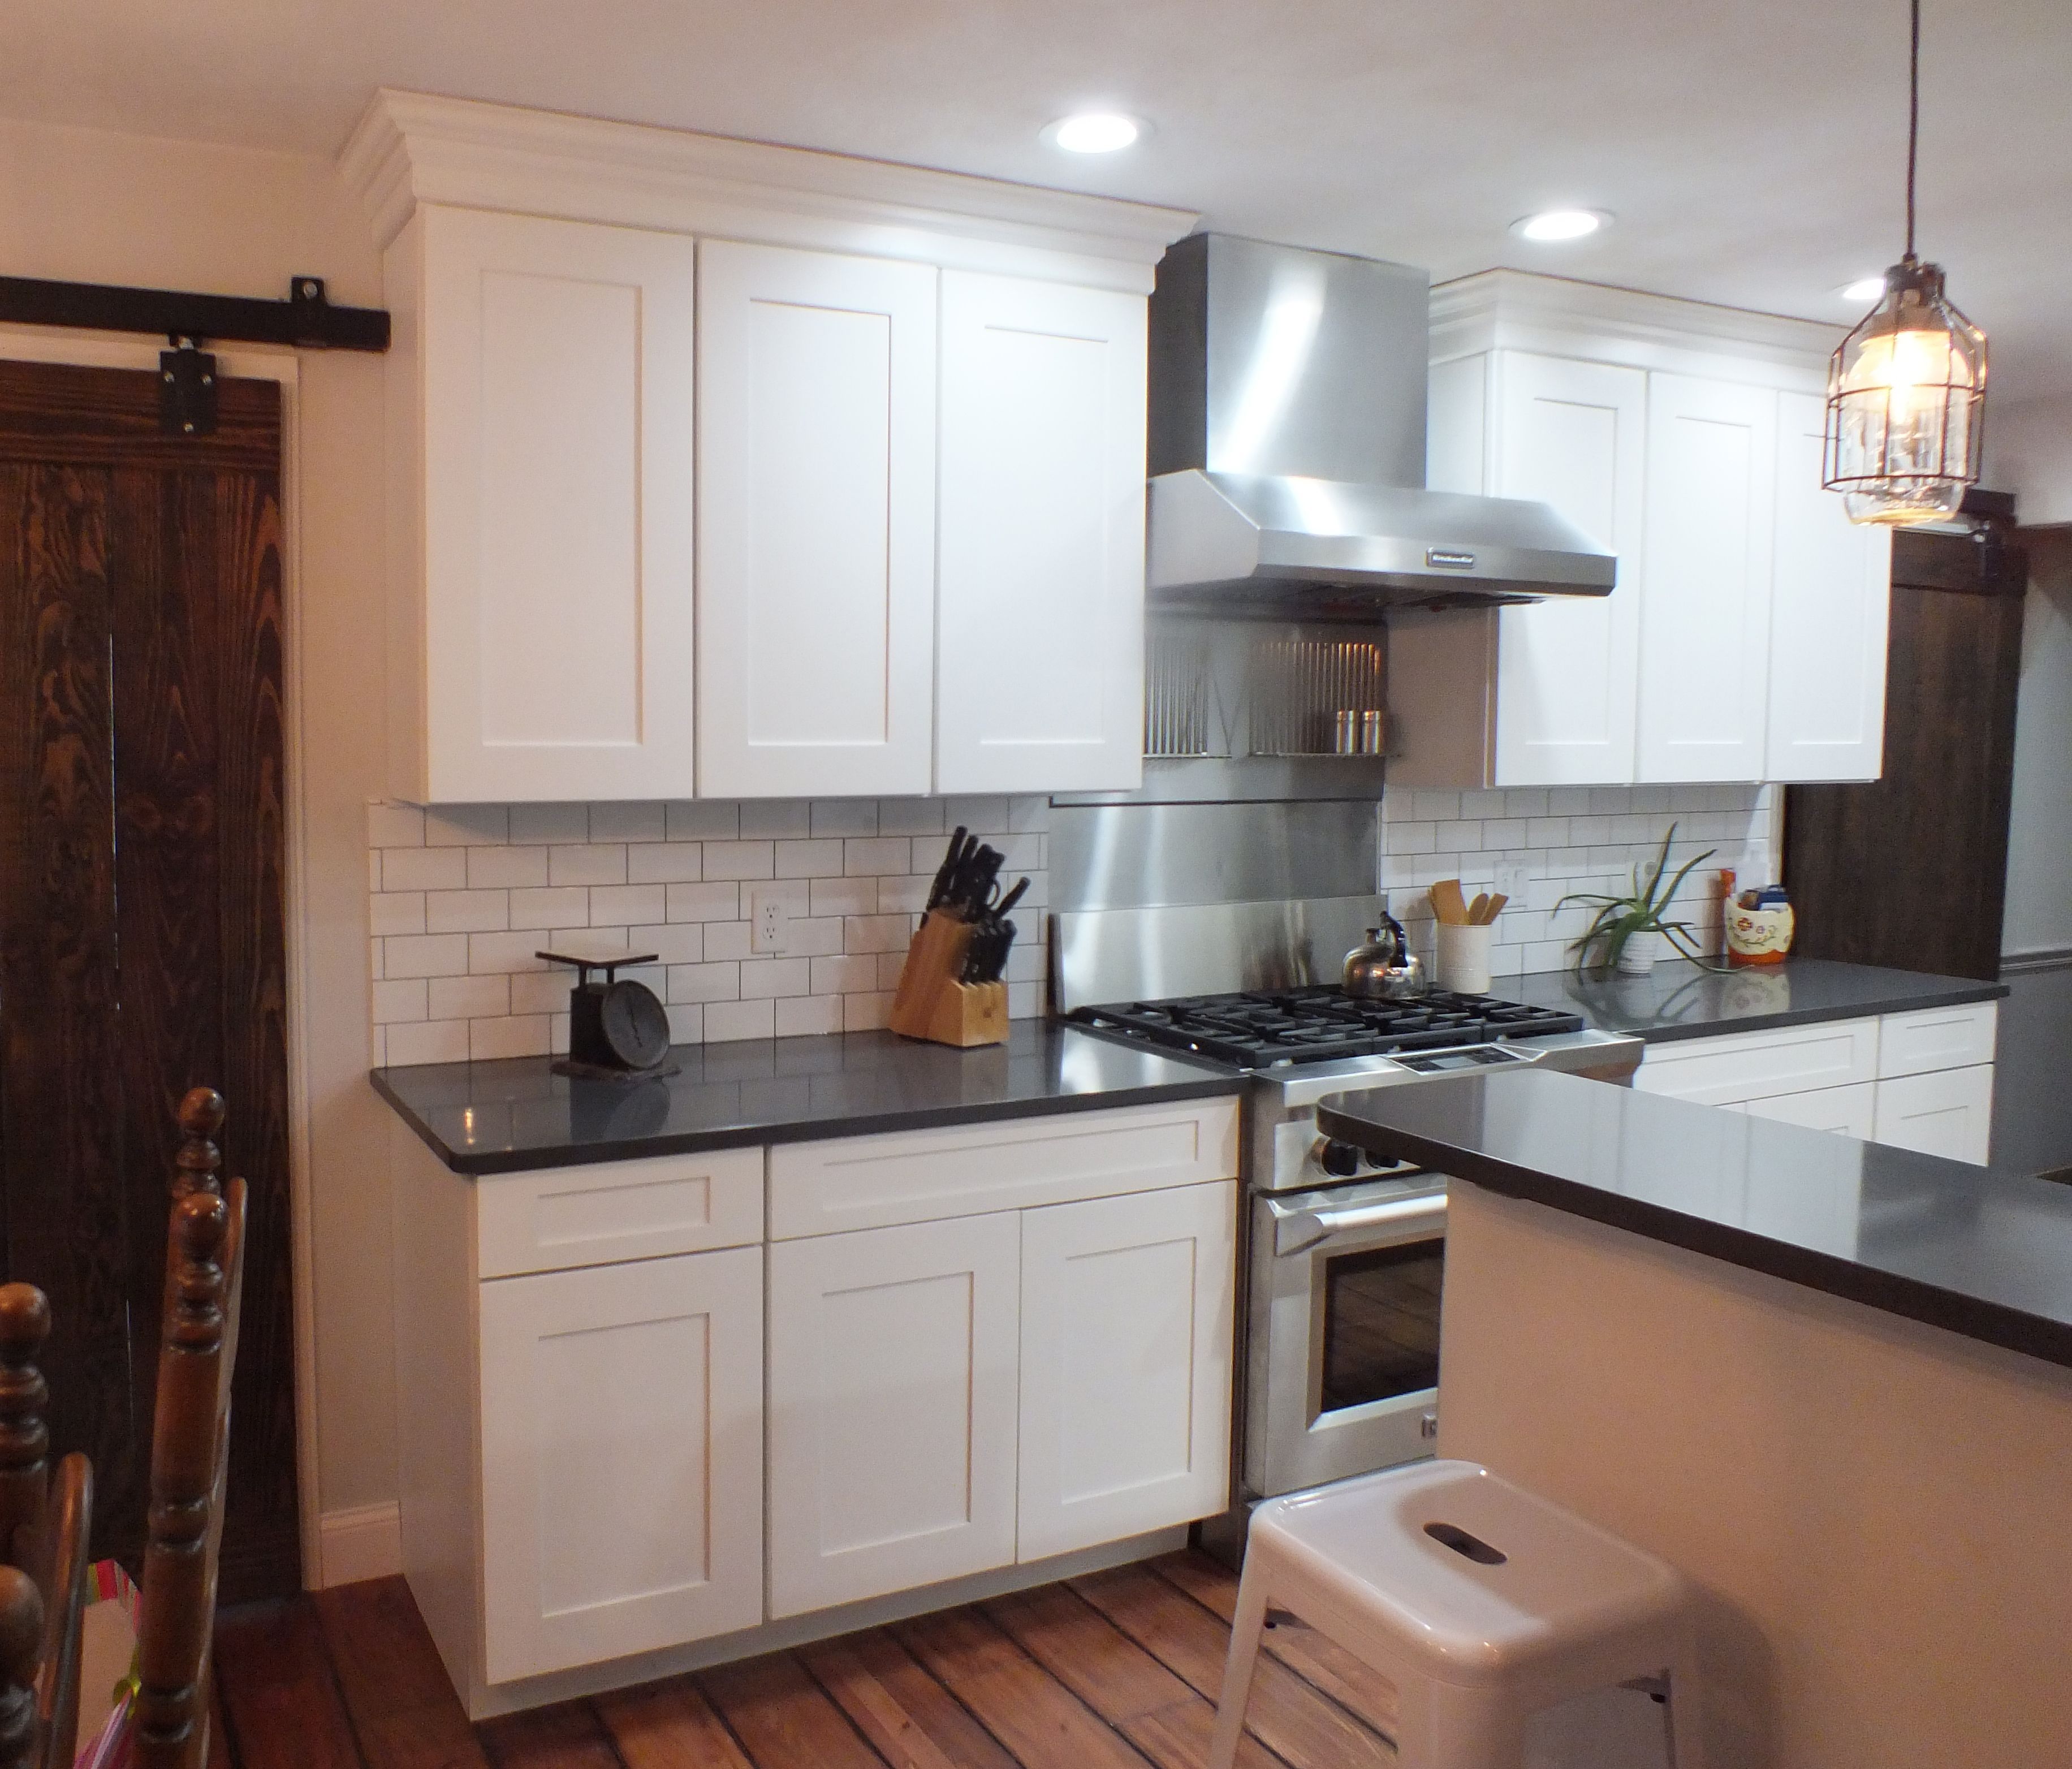 kitchen kountry cabinets hobo kitchen plumbing contractor. Black Bedroom Furniture Sets. Home Design Ideas